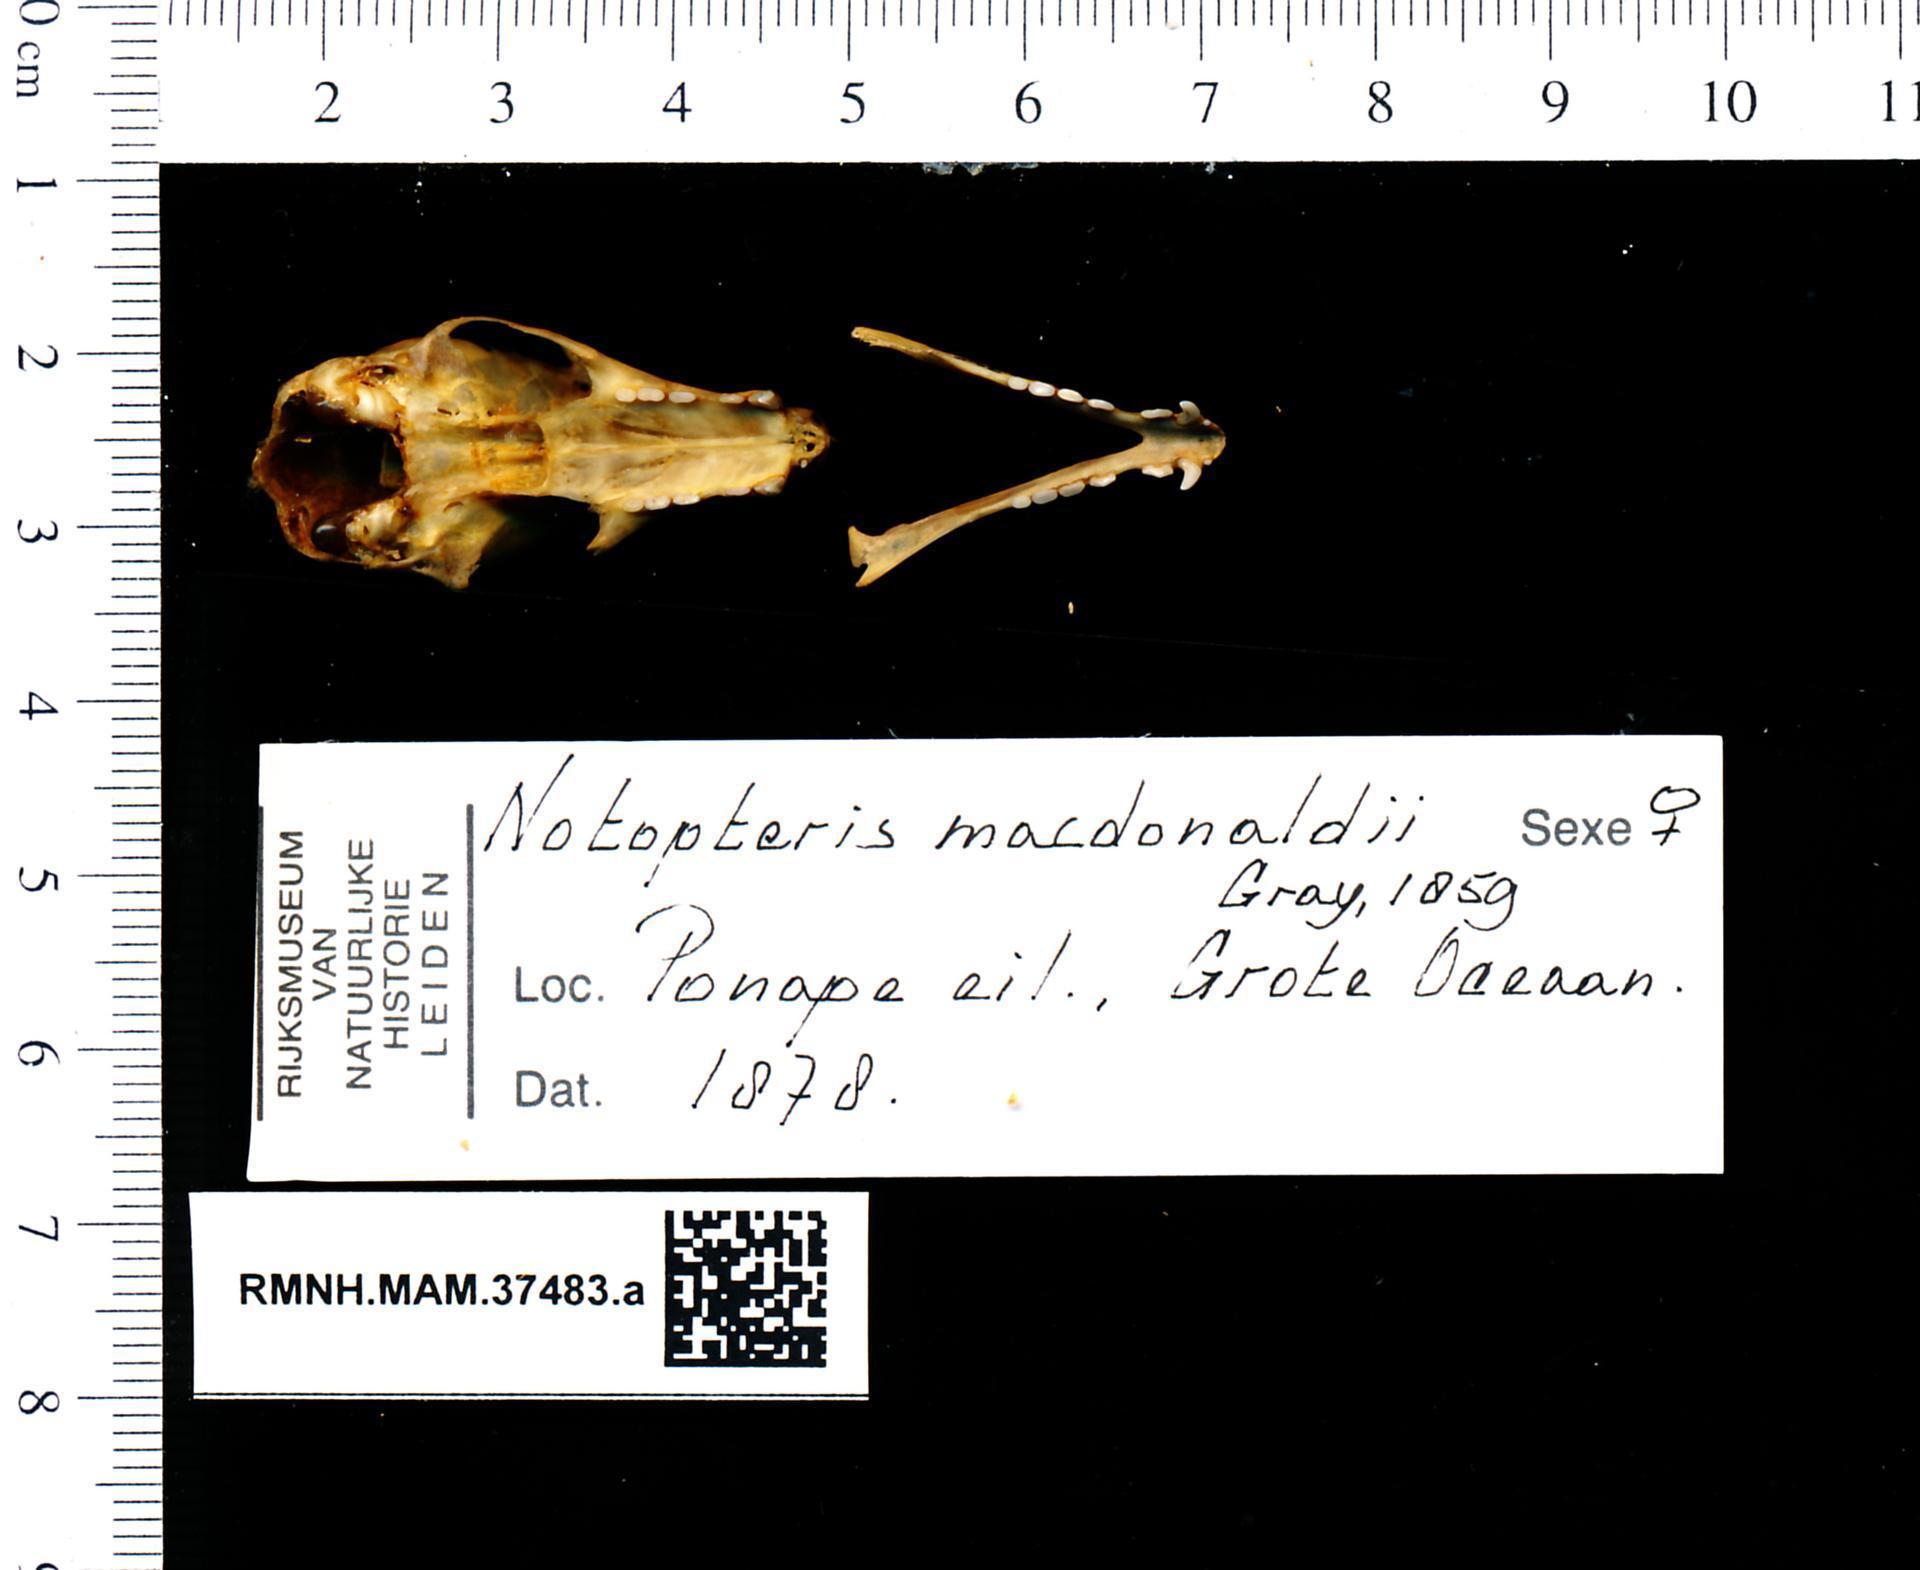 Image of Notopteris macdonaldi